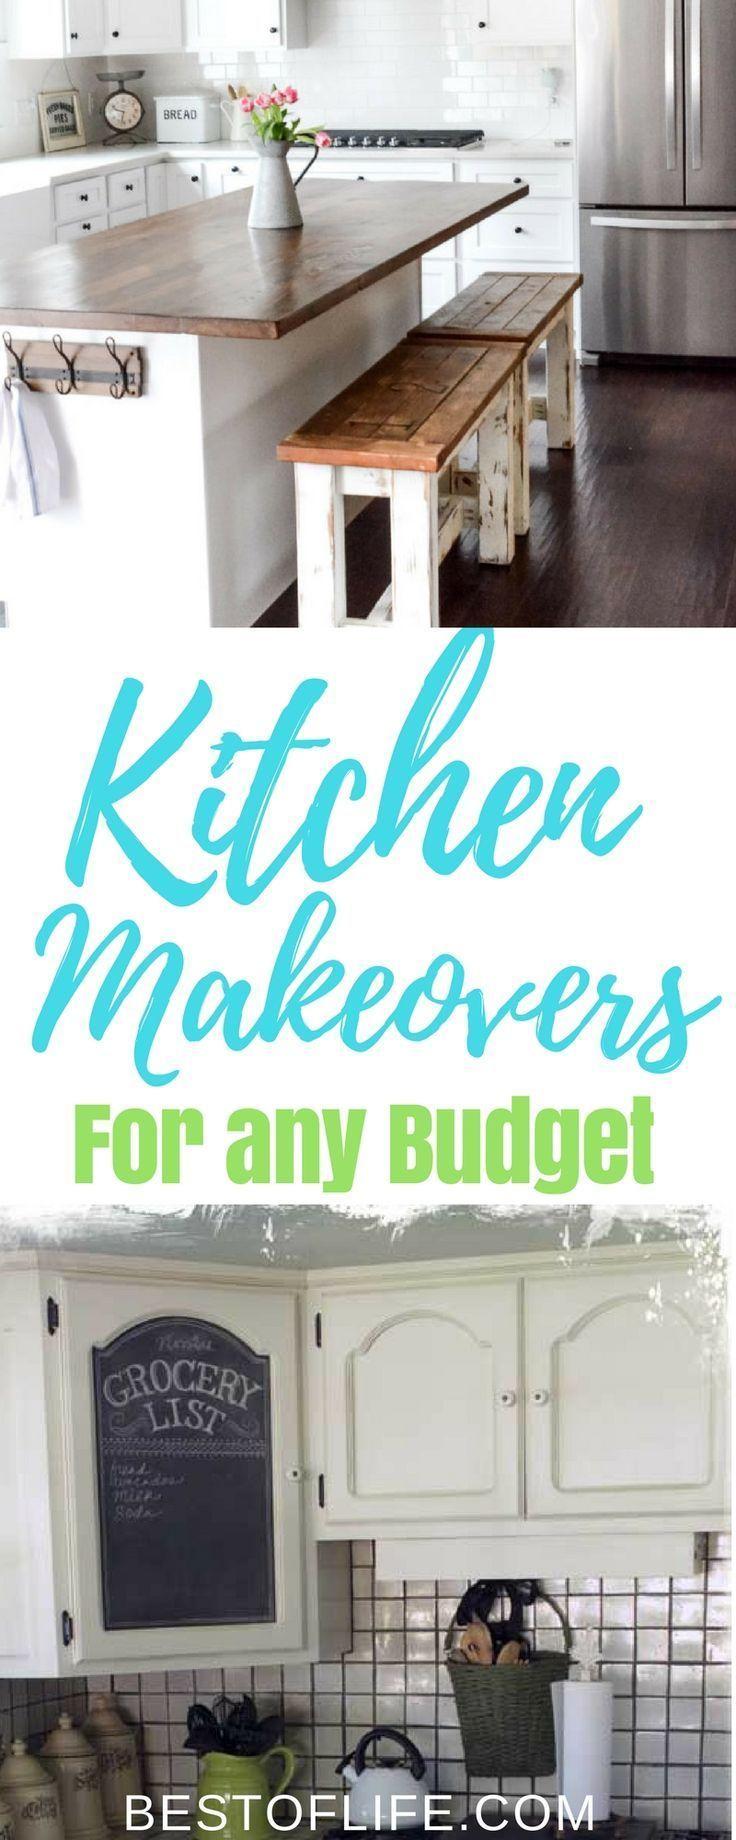 DIY Kitchen Makeover Ideas for any Budget | Pinterest | Diy kitchen ...